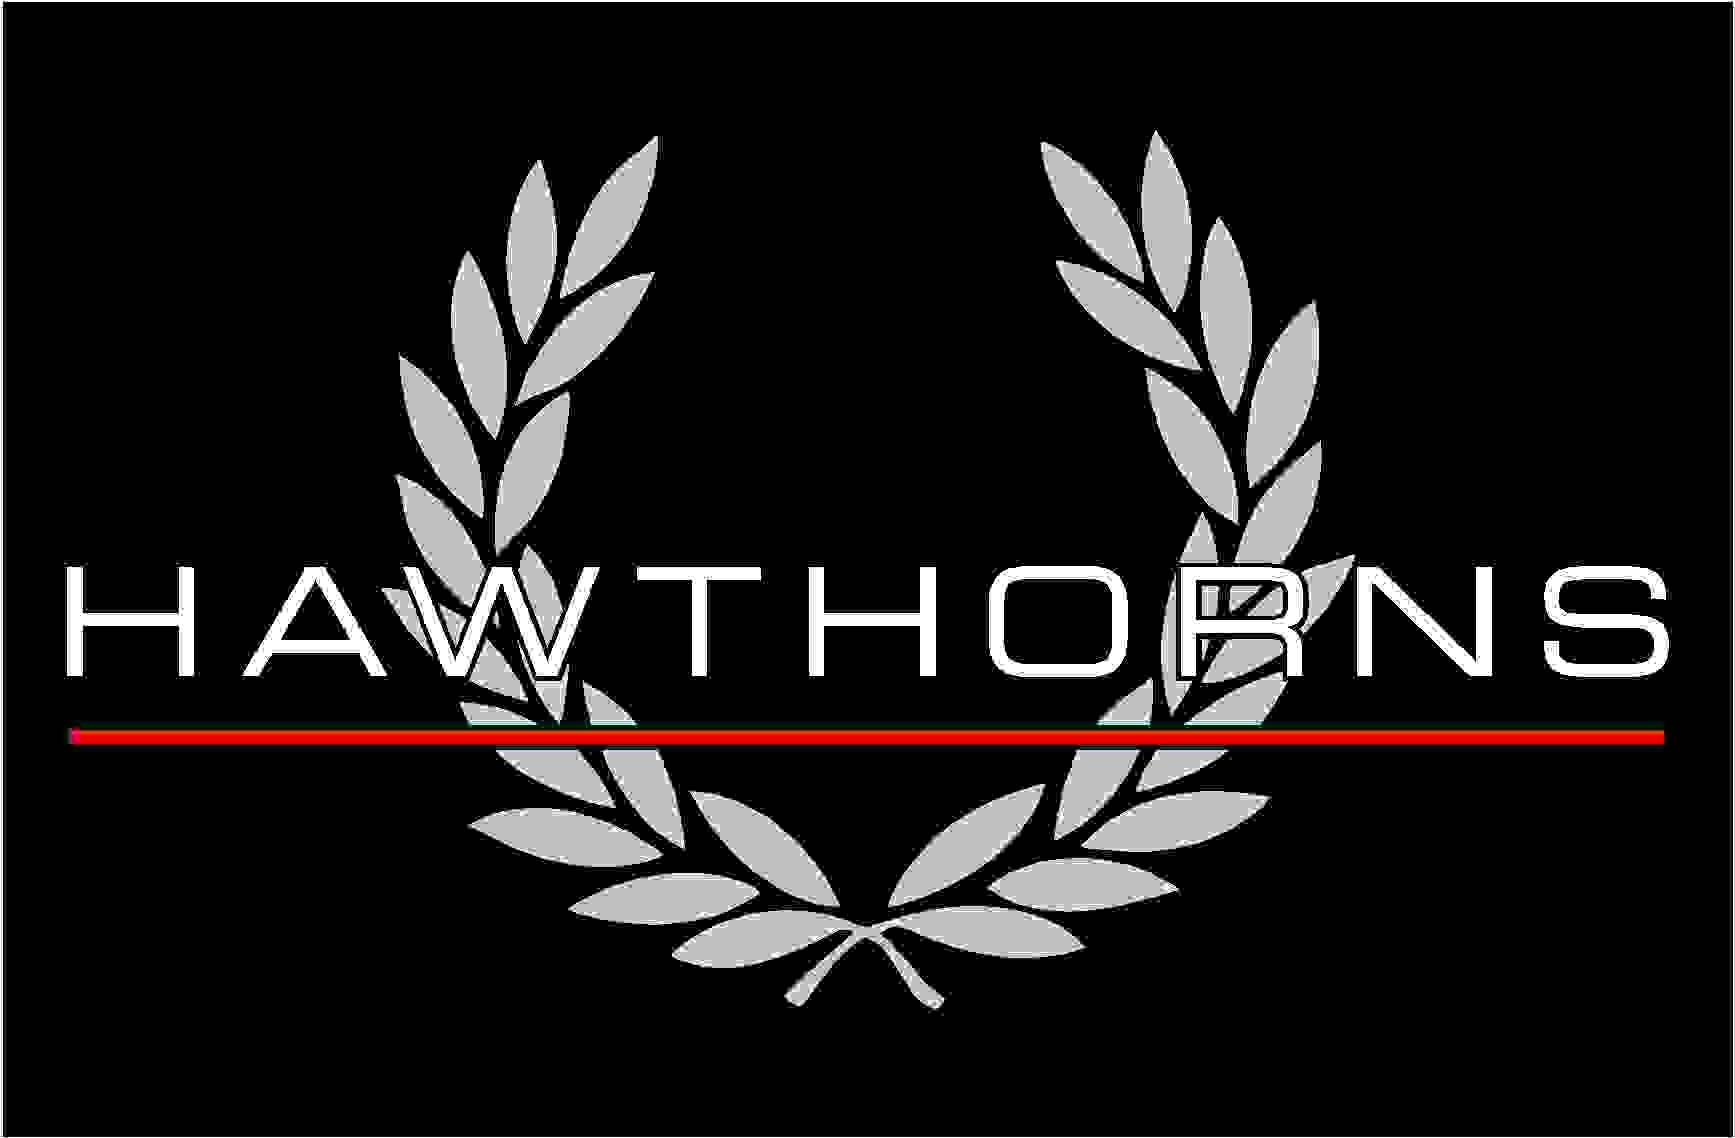 Hawthorns